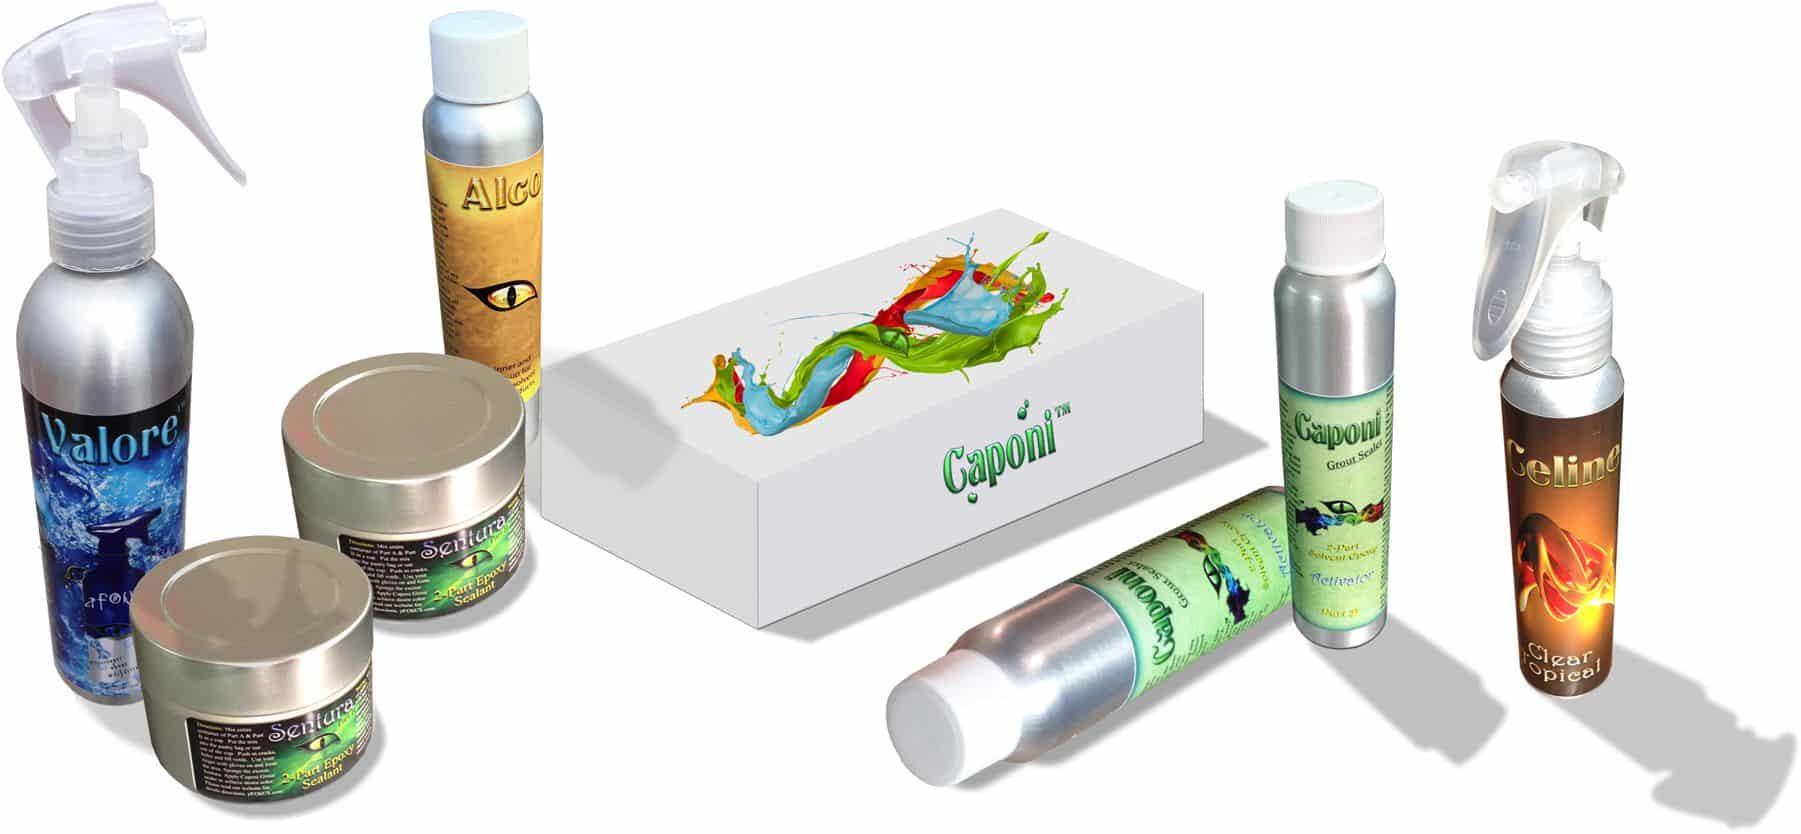 pFOkUS Bestselling Shower Restoration Products